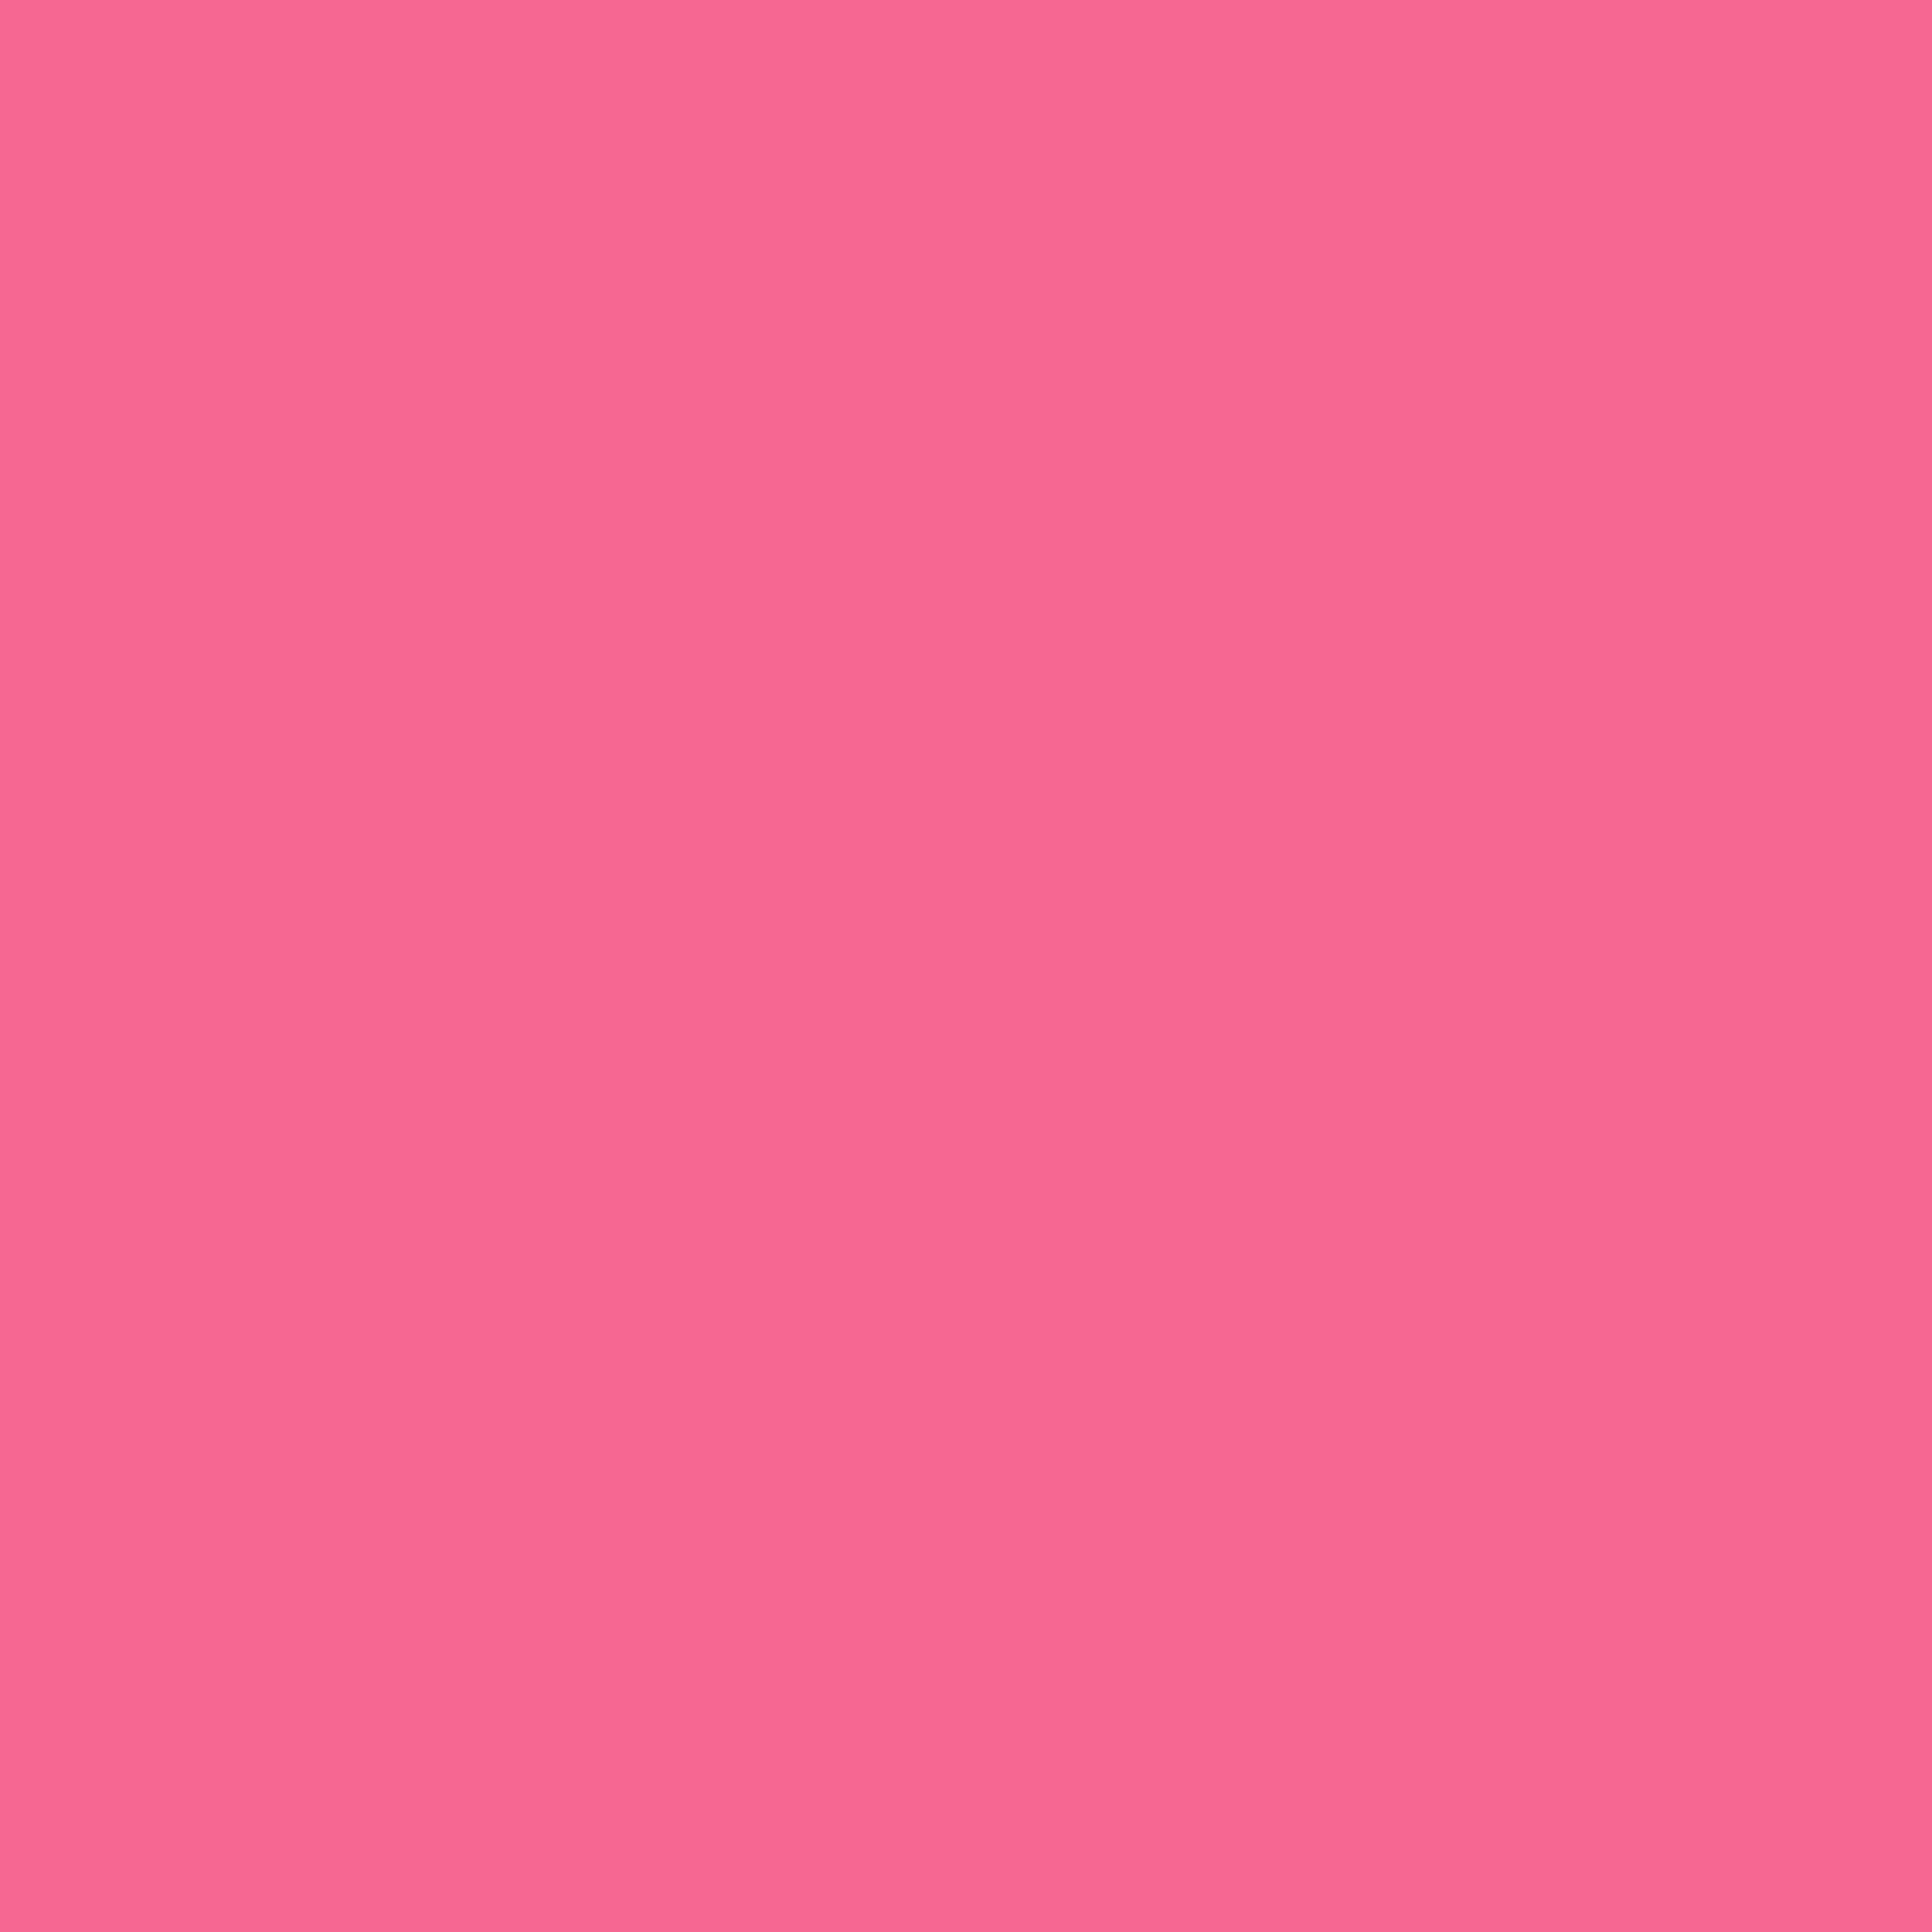 2732x2732 Light Crimson Solid Color Background